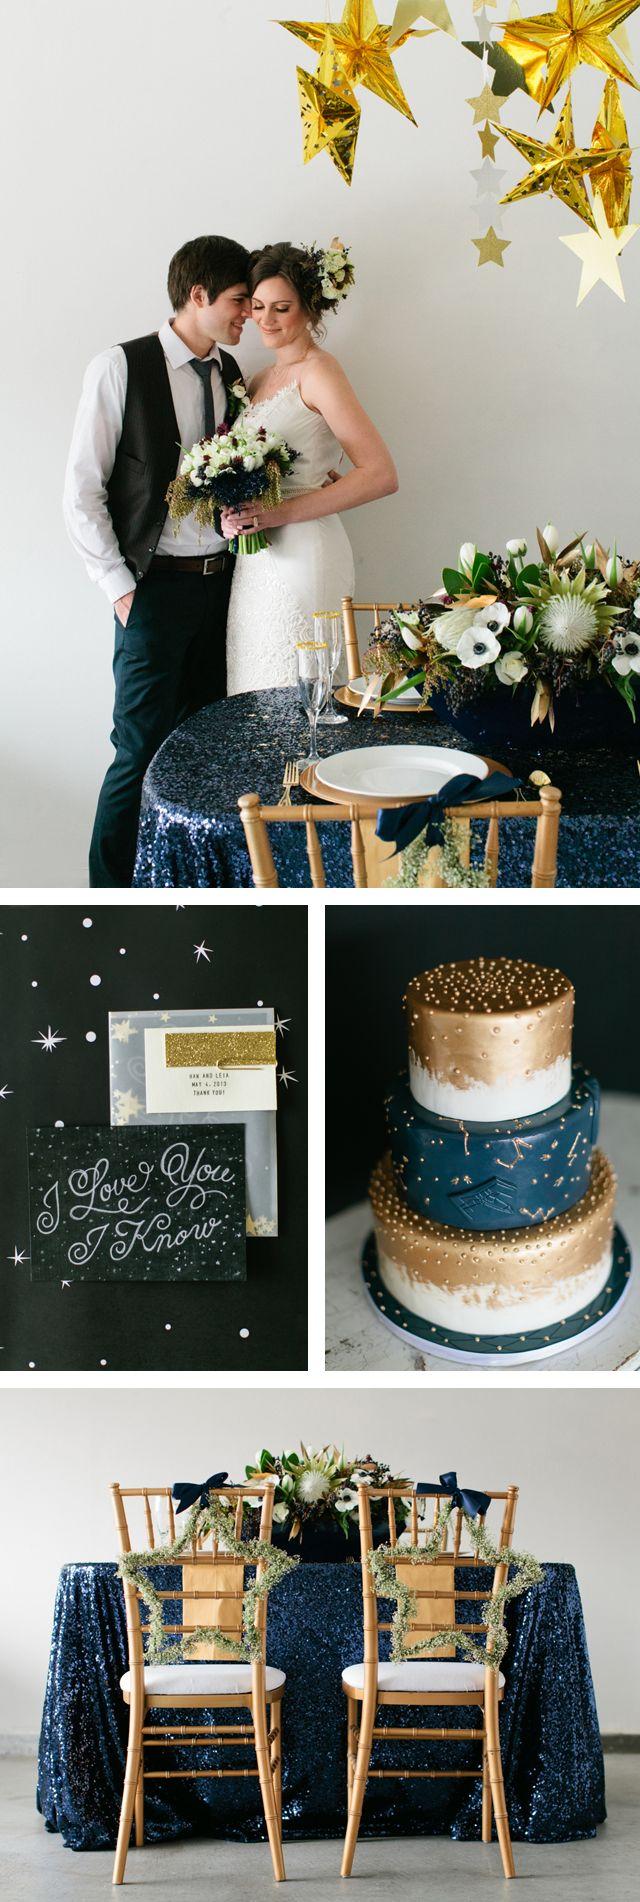 Star Wars Wedding Inspiration By Las Vegas Photographer